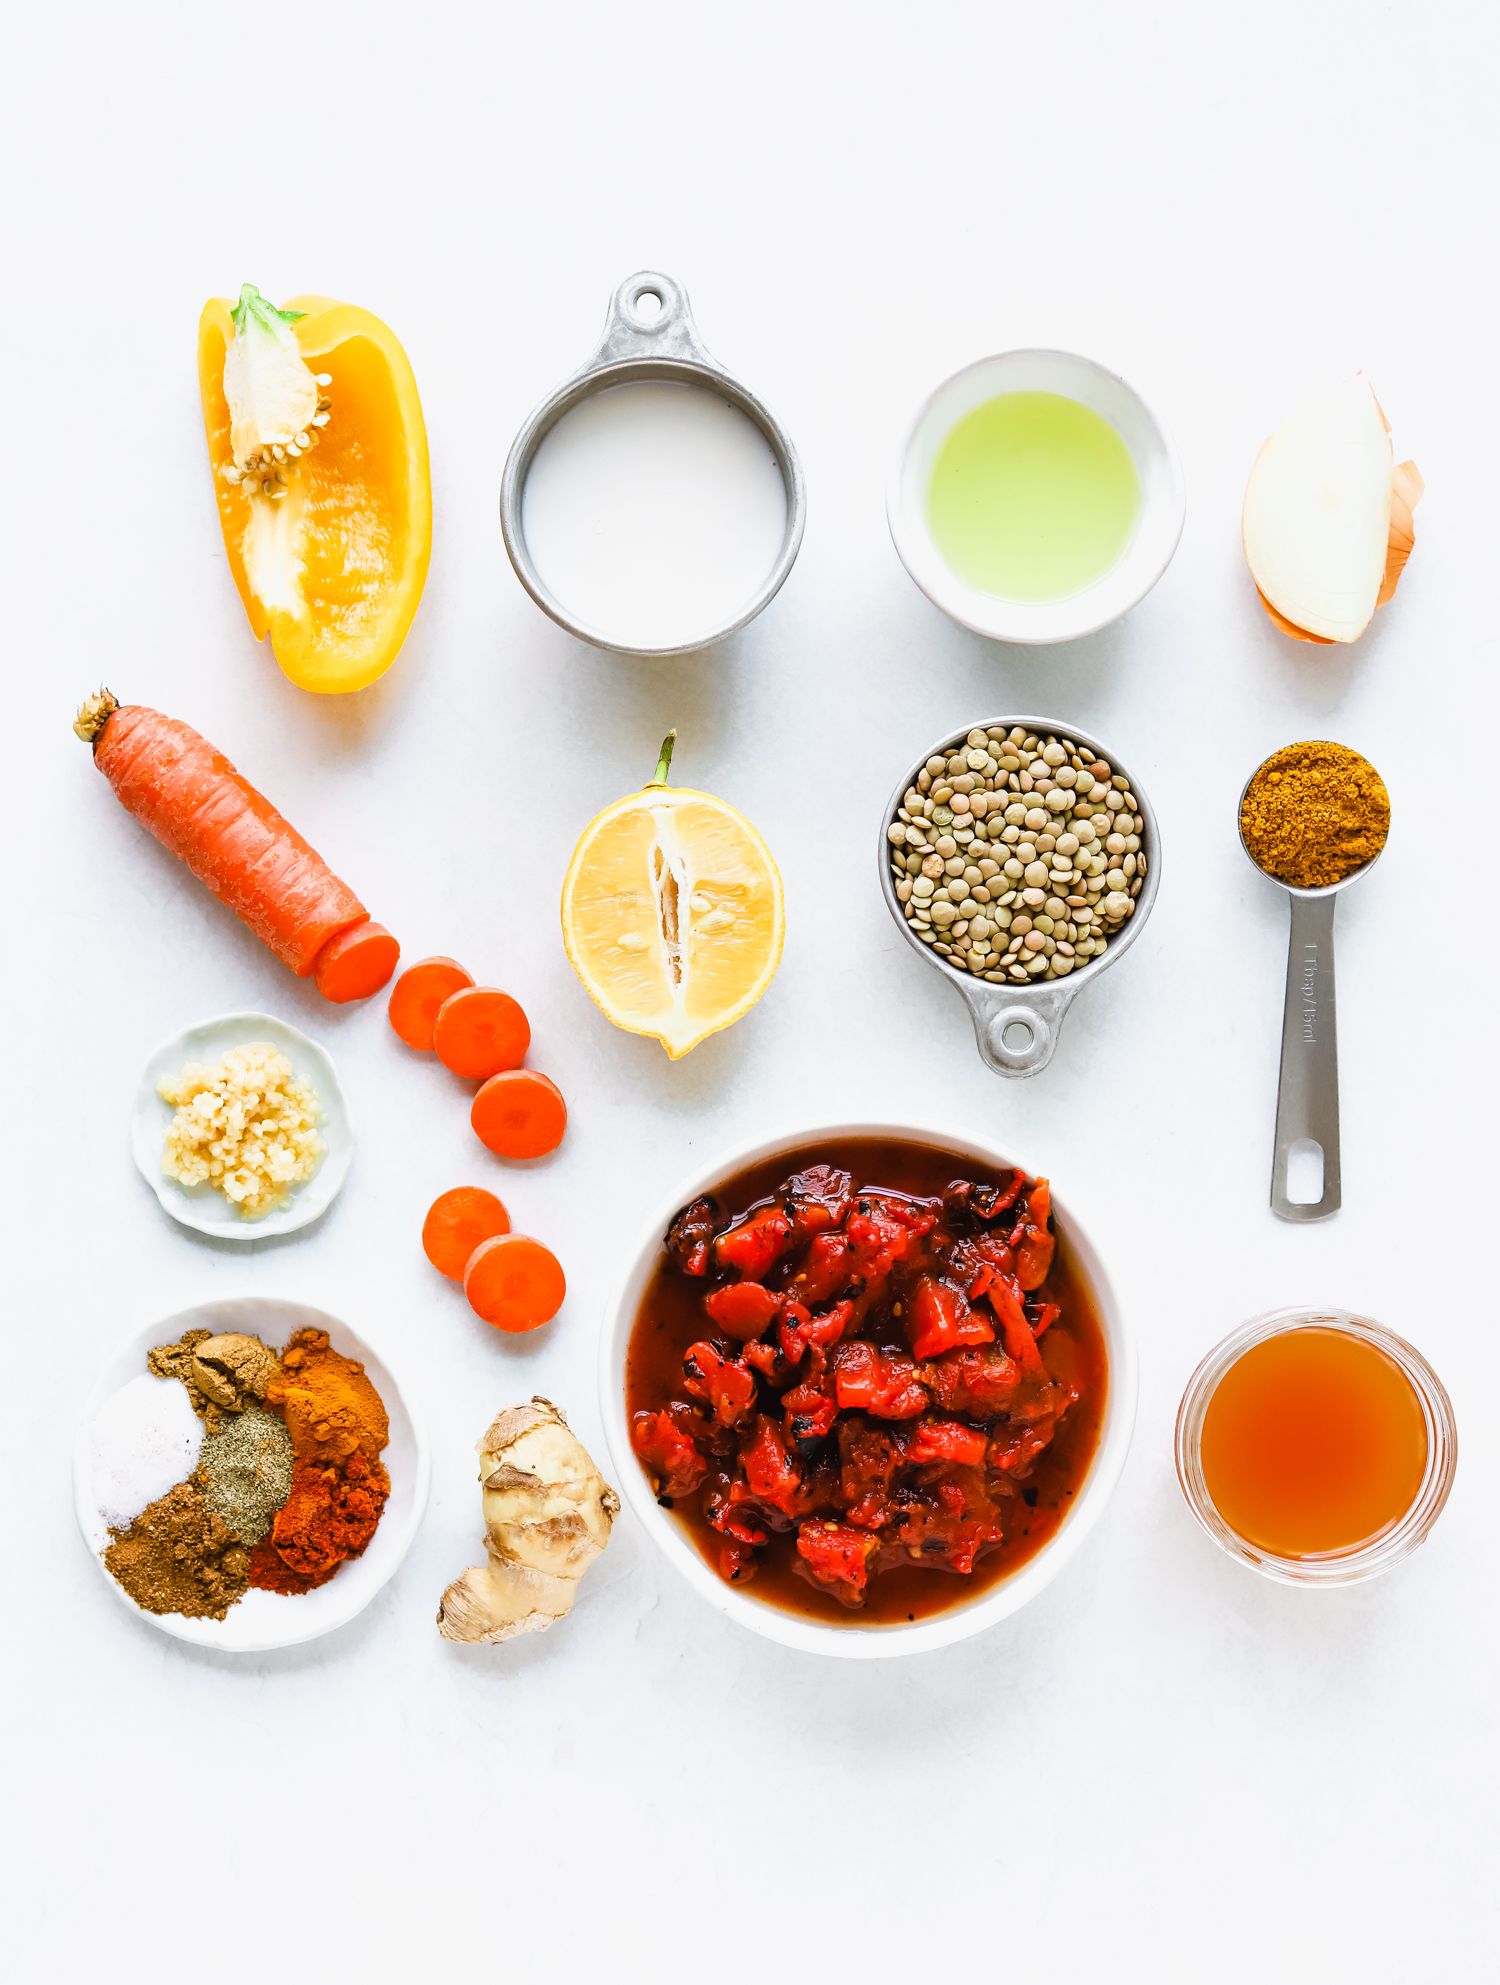 Ingredients for making vegan almond milk lentil curry